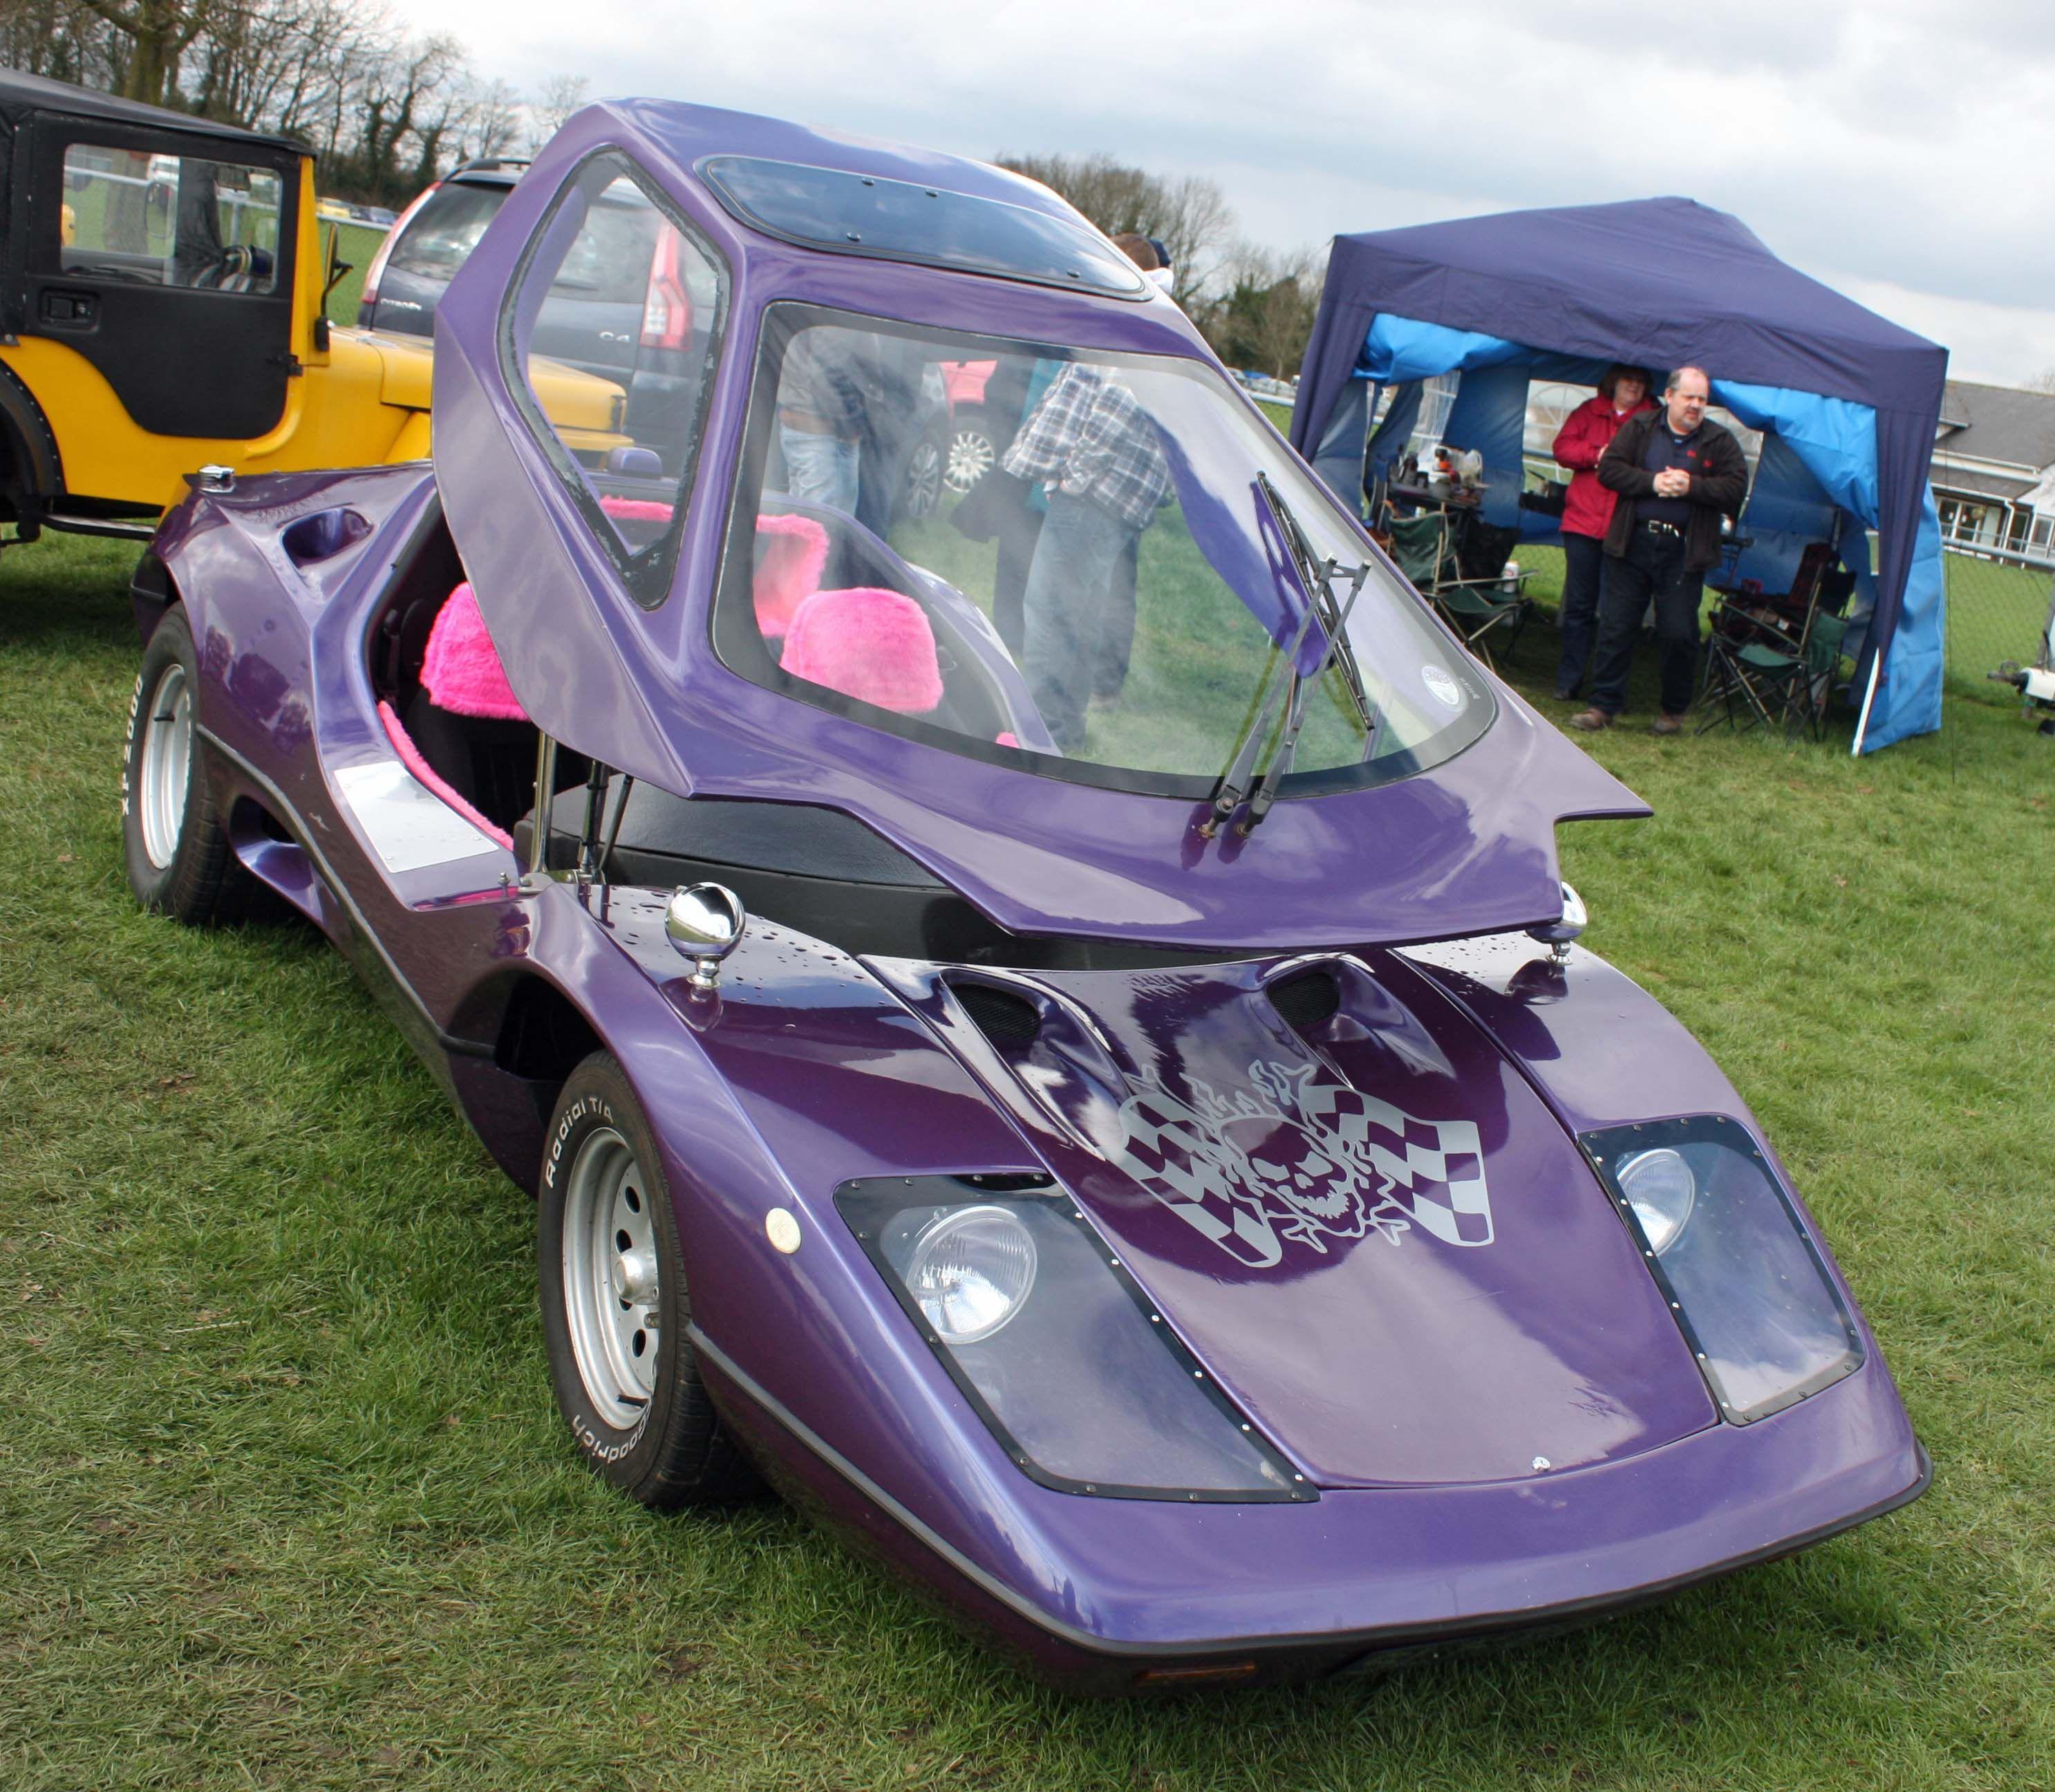 crazy car at the kit car show kent uk cars crazy cool. Black Bedroom Furniture Sets. Home Design Ideas